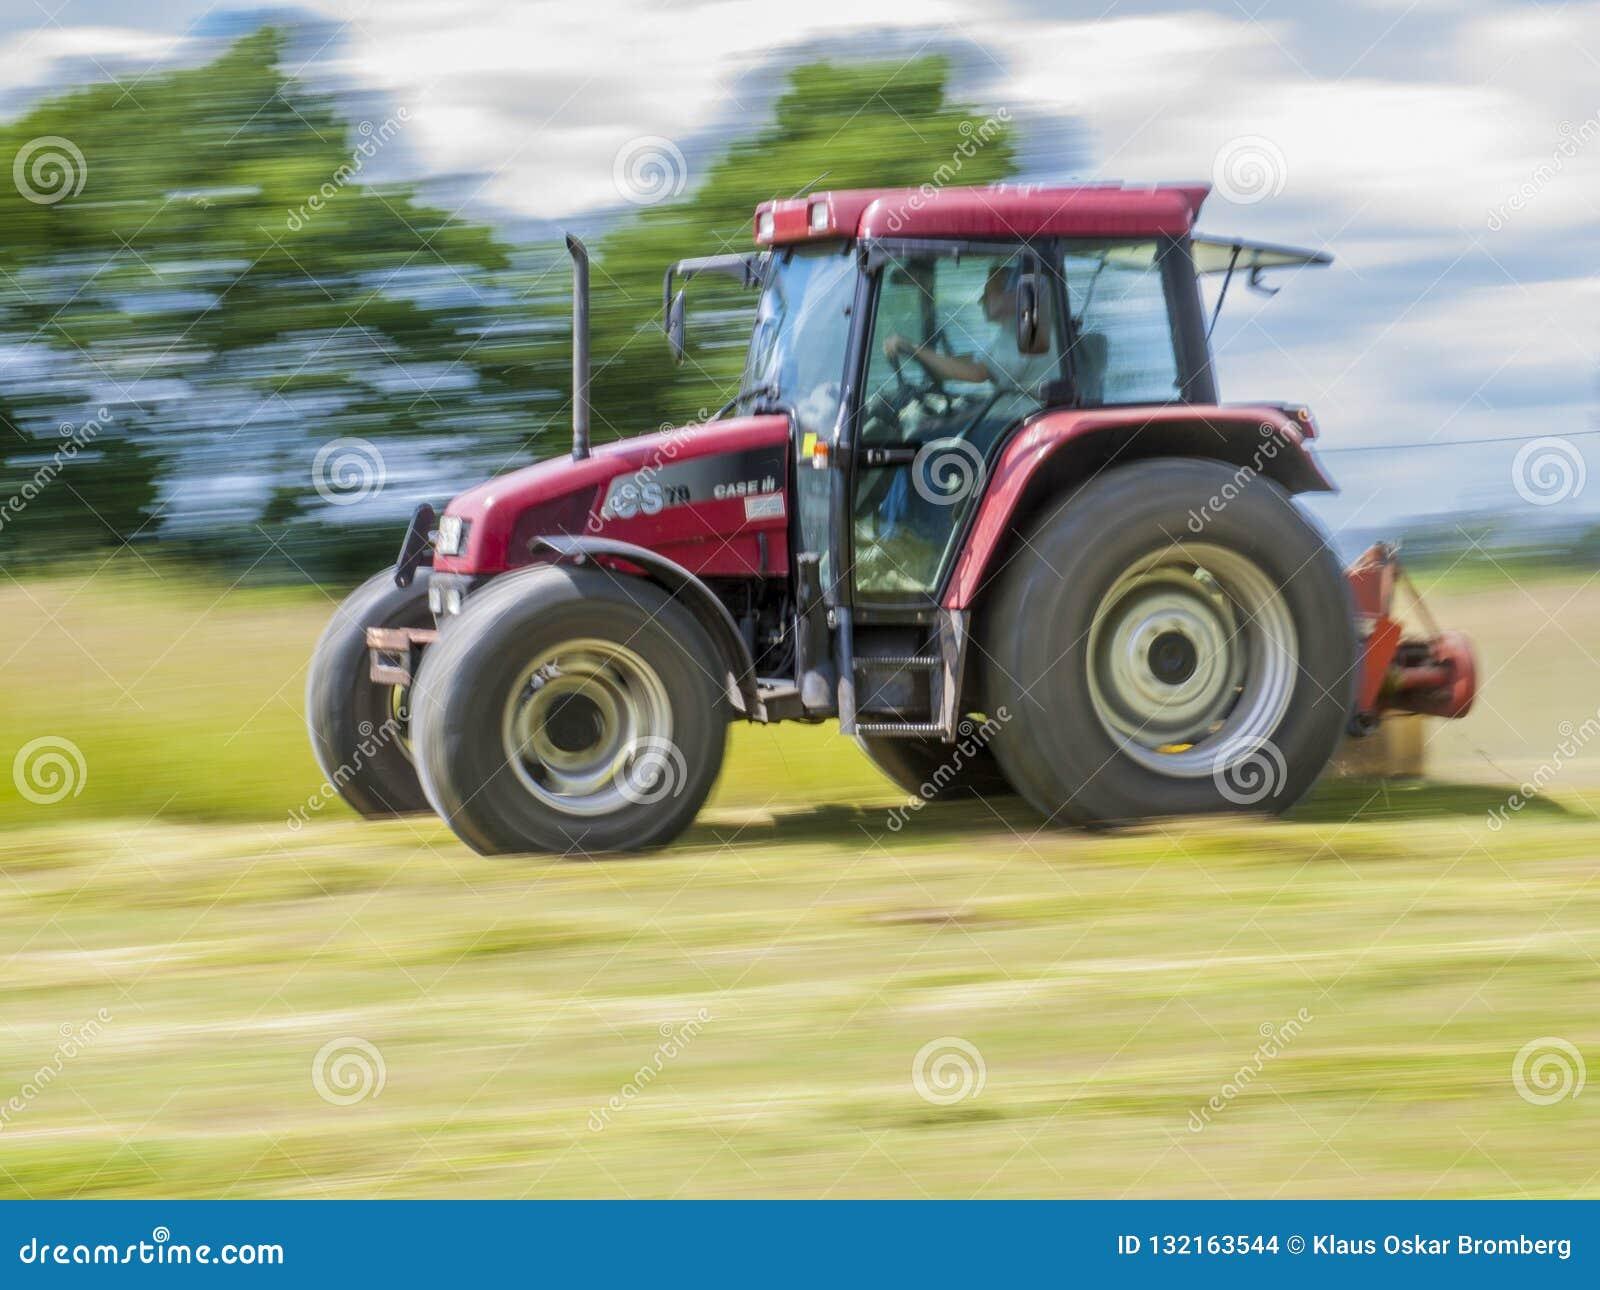 The motorized farmer